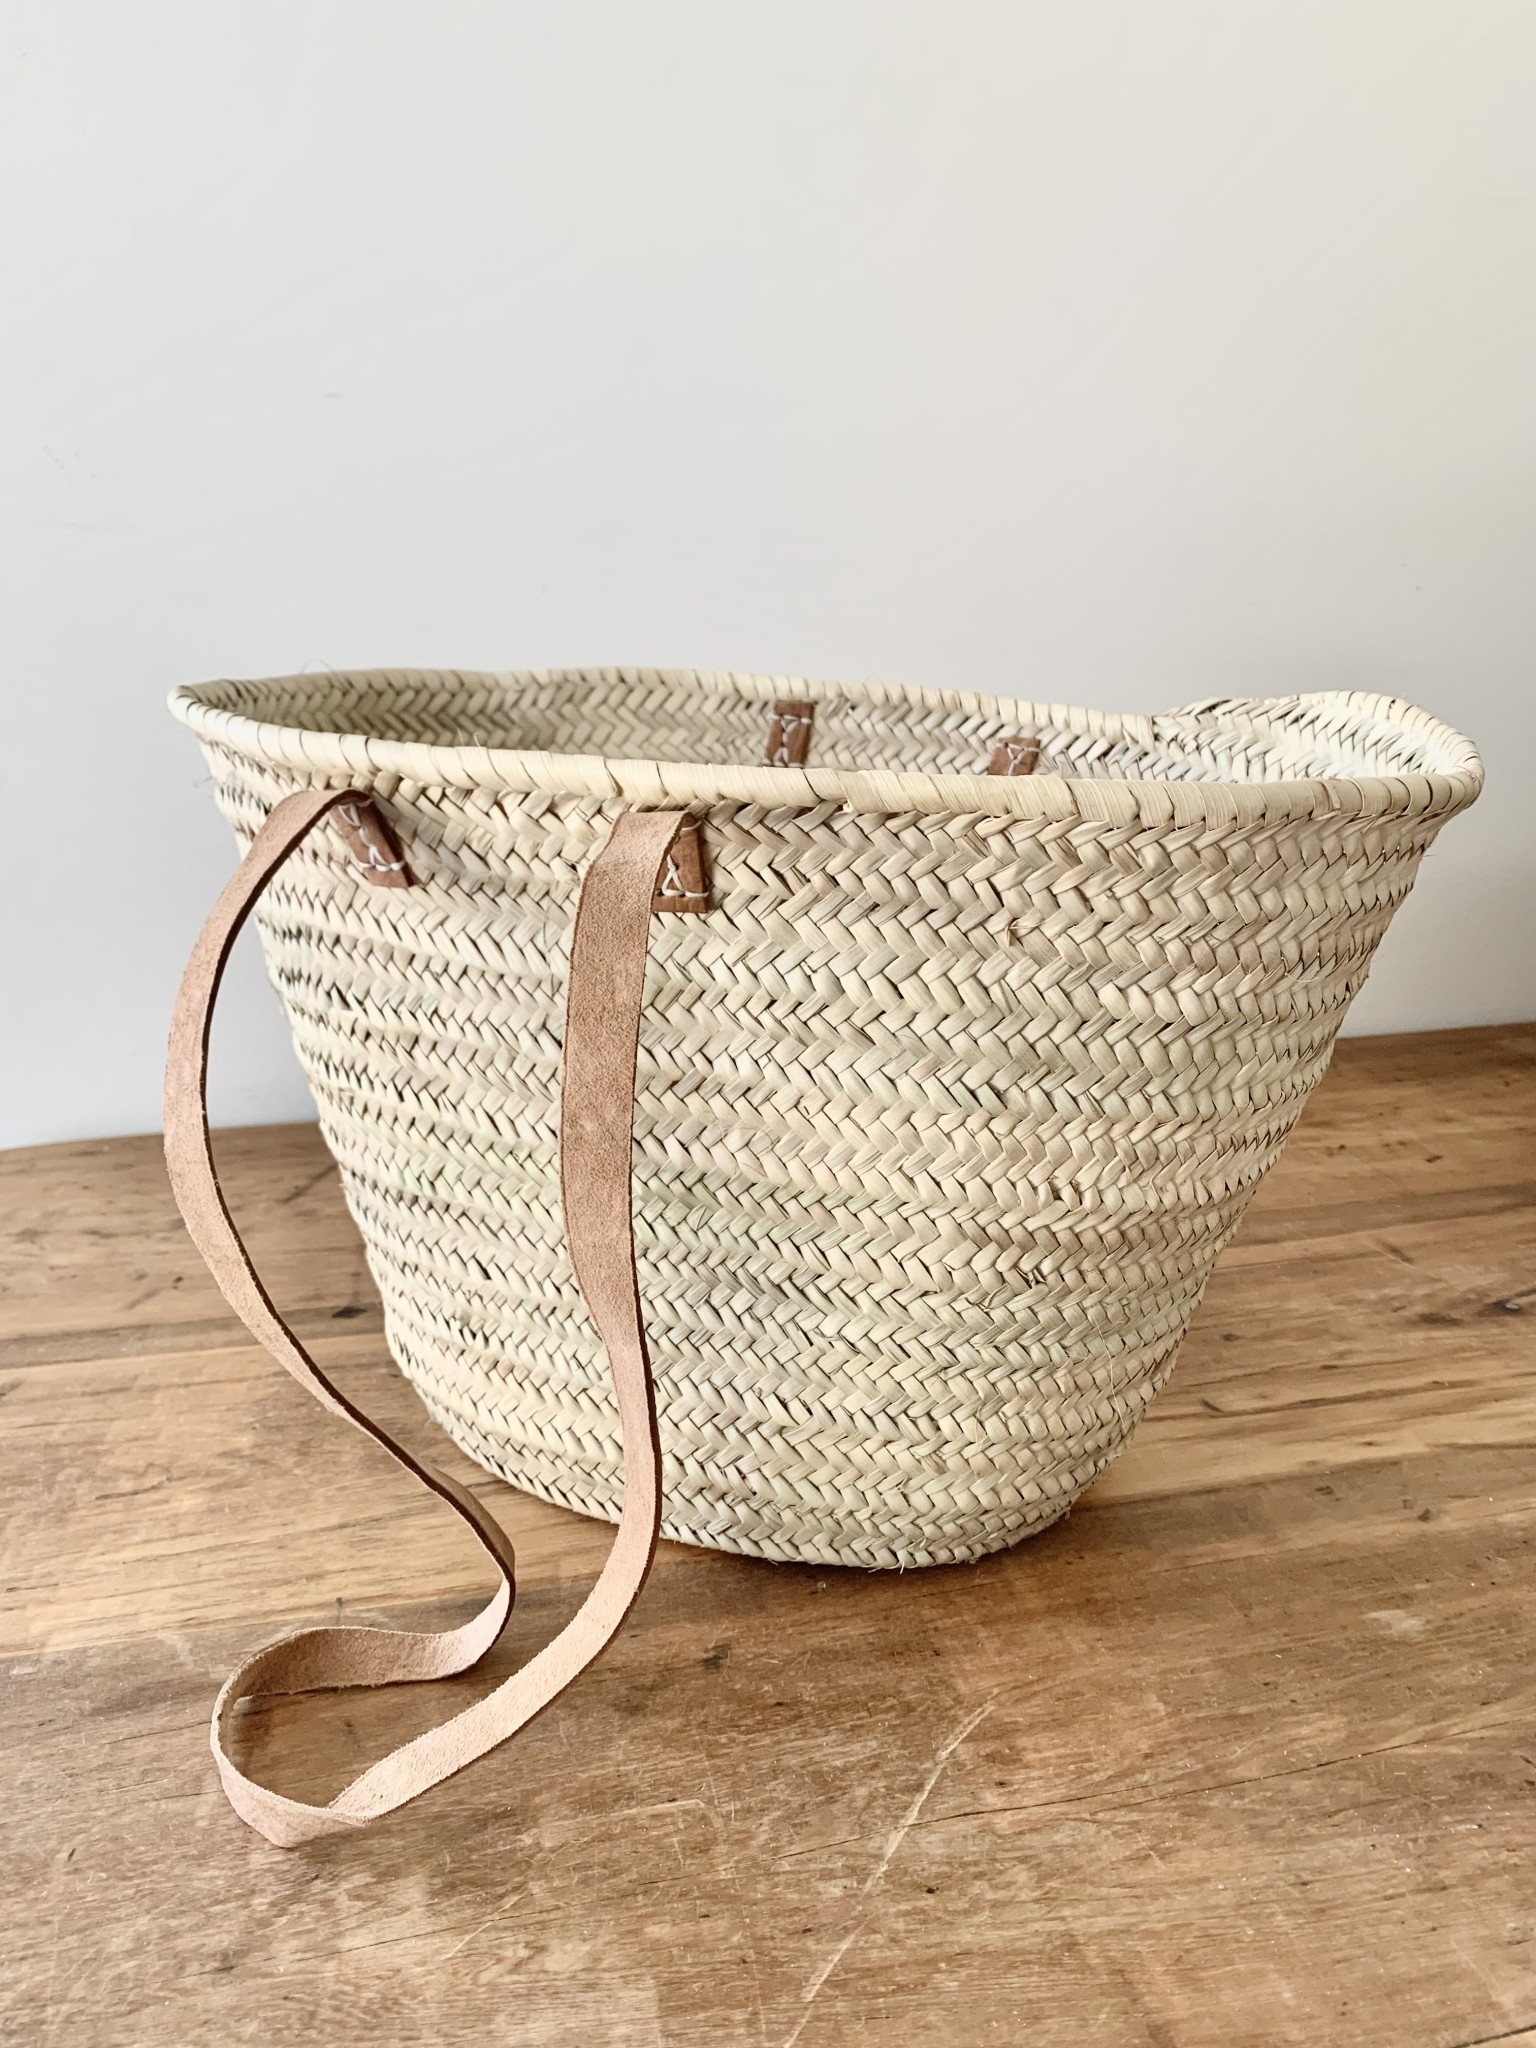 Long Handle French Market Basket - Light